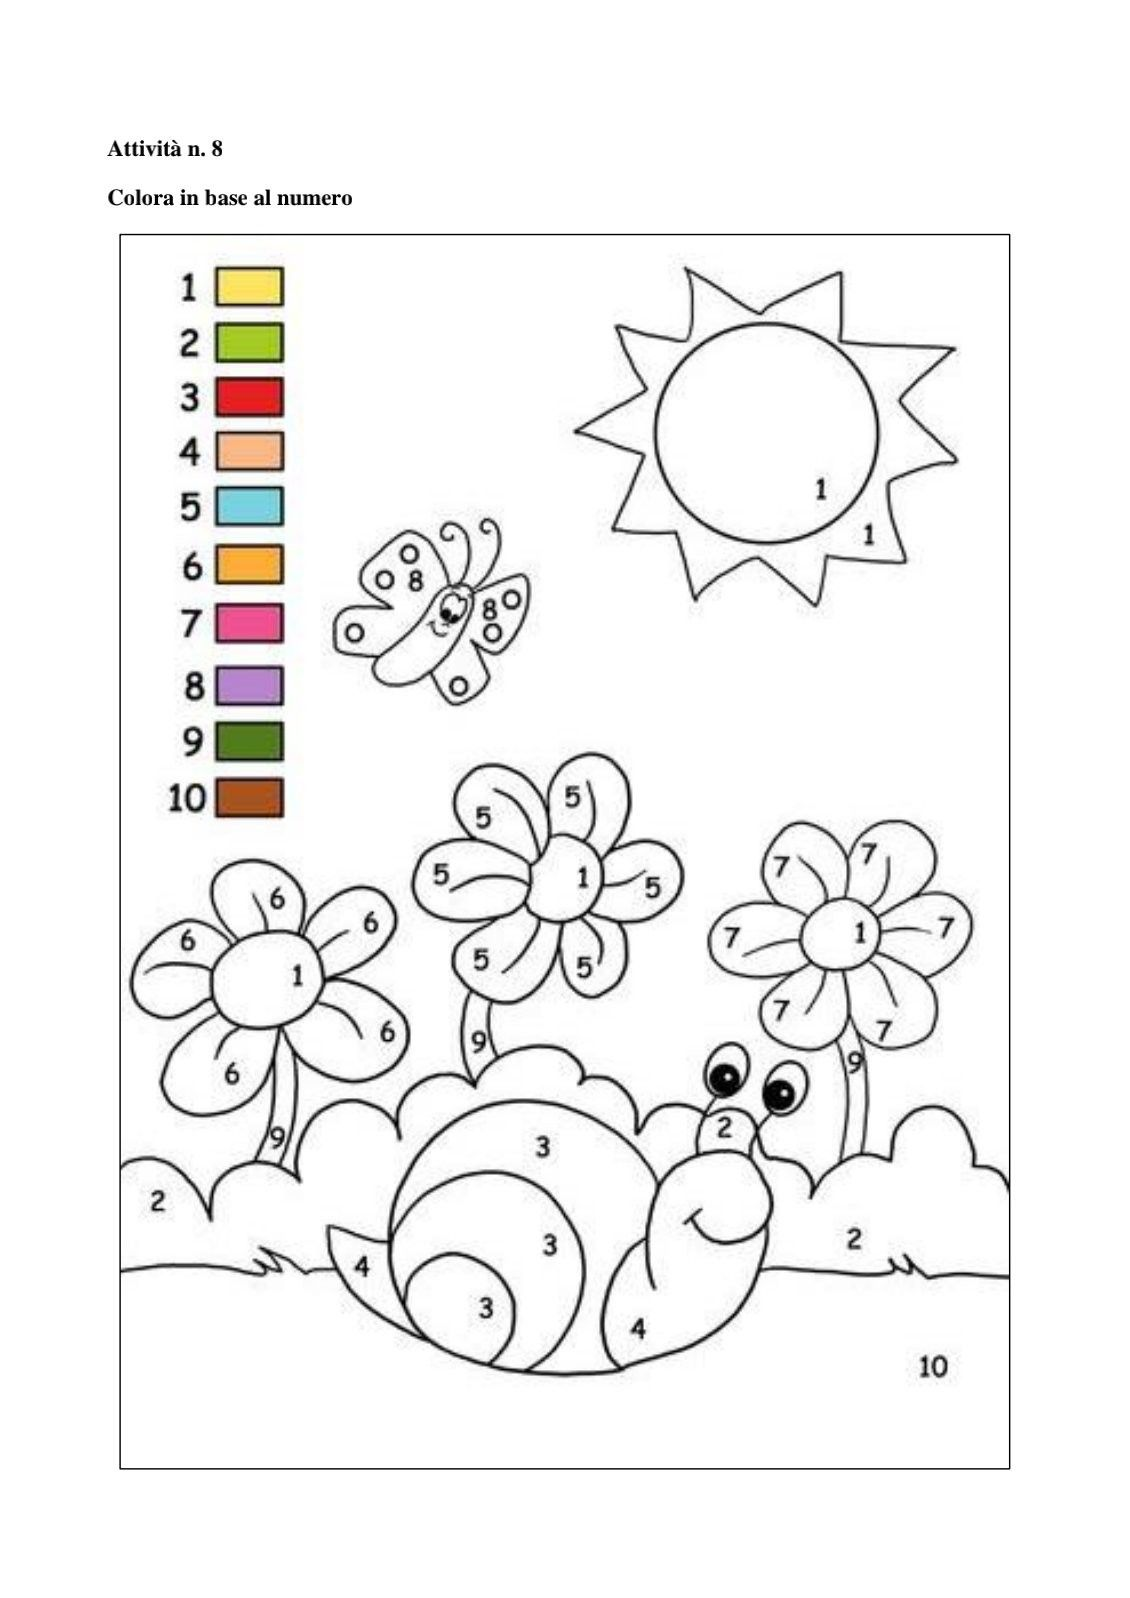 Pin By Nikolett On Sophia Scuola Kindergarten Coloring Pages Activity Sheets For Kids Kindergarten Colors [ 1598 x 1130 Pixel ]